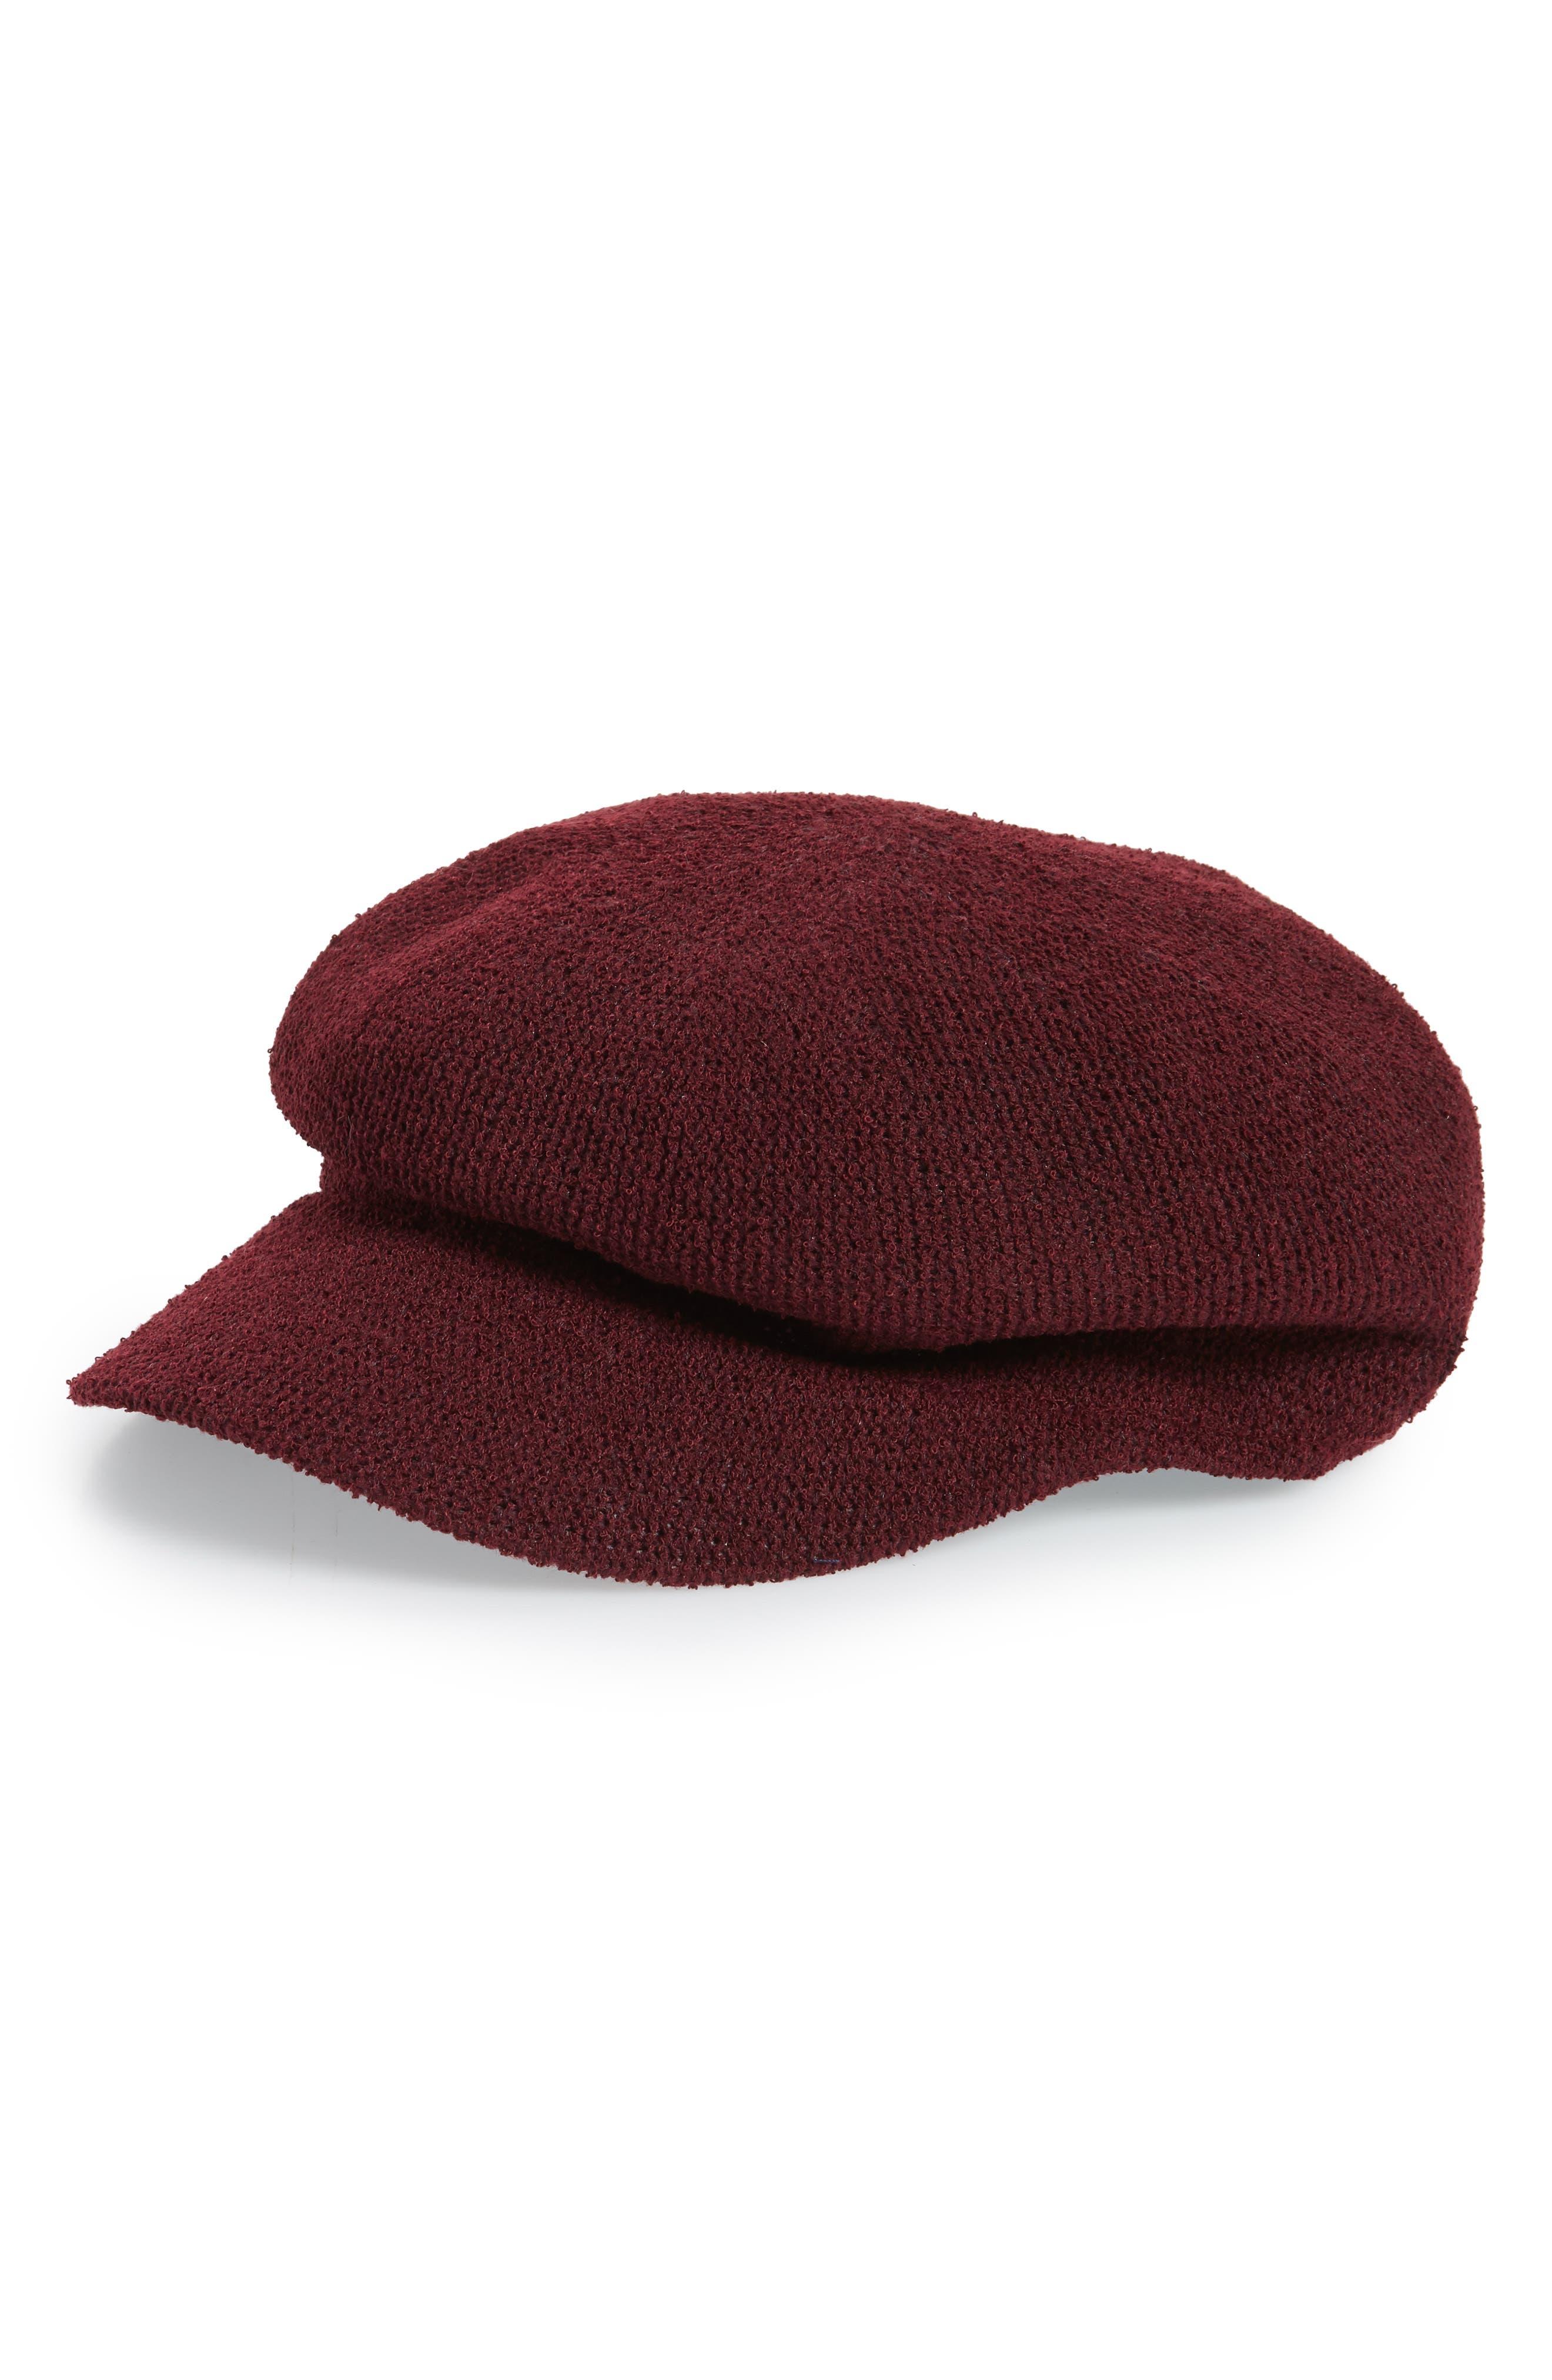 Baker Boy Hat,                             Main thumbnail 1, color,                             600